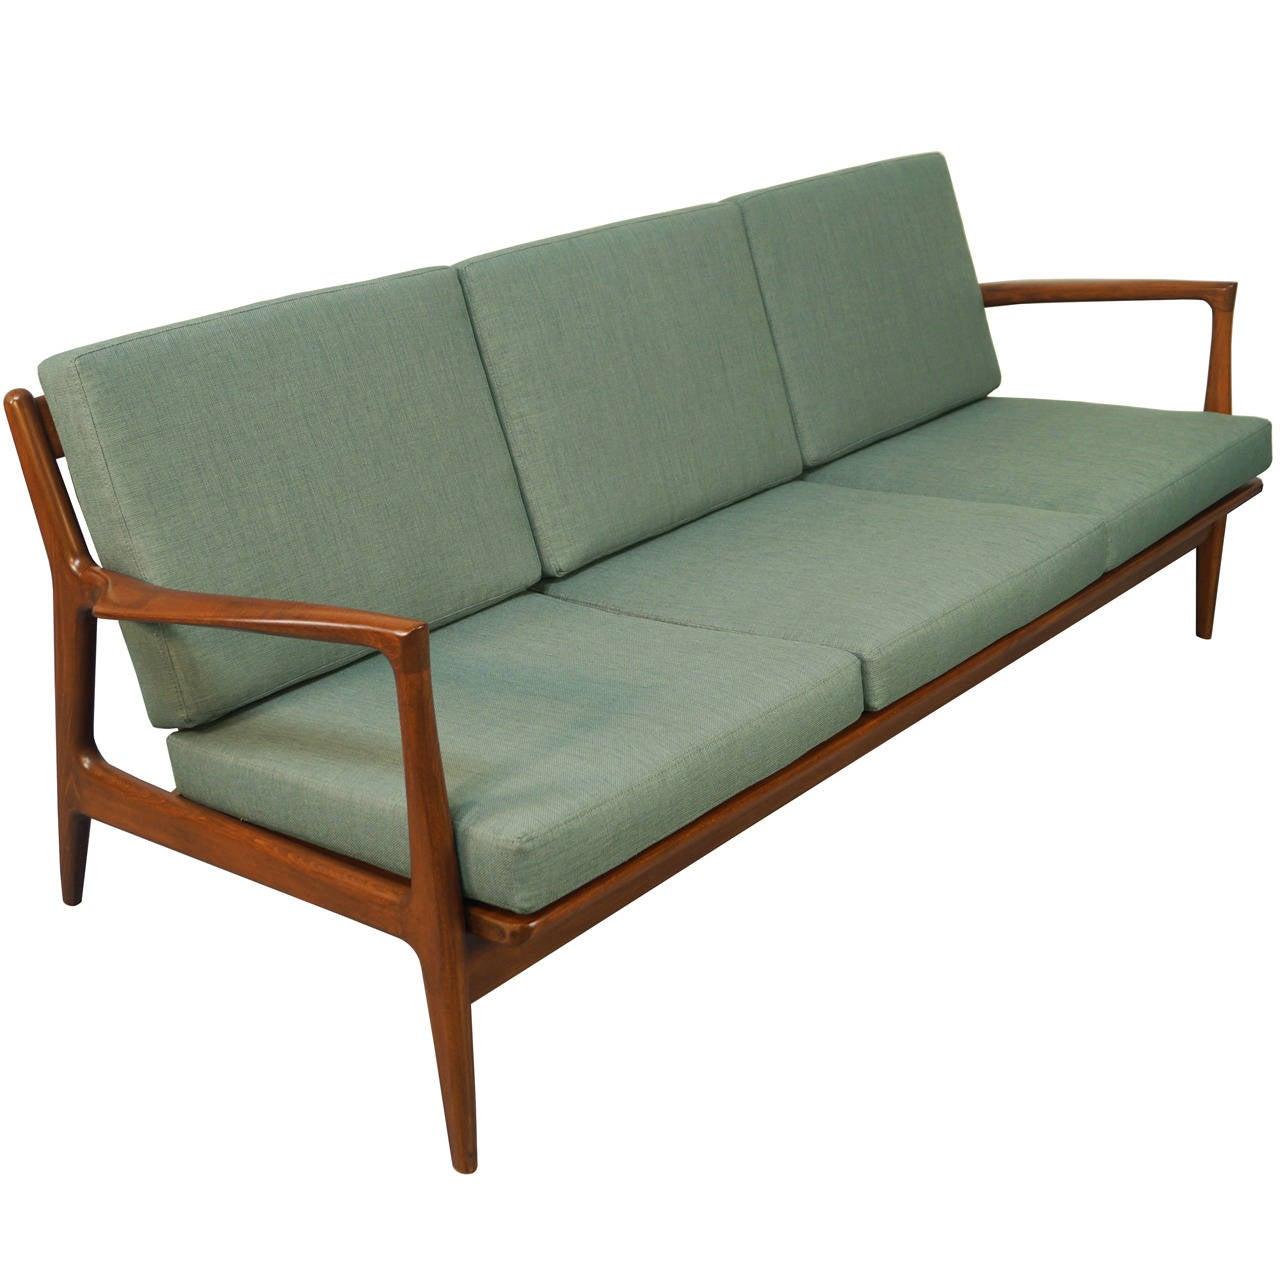 Danish Modern Sofa by Ib KofodLarsen at 1stdibs